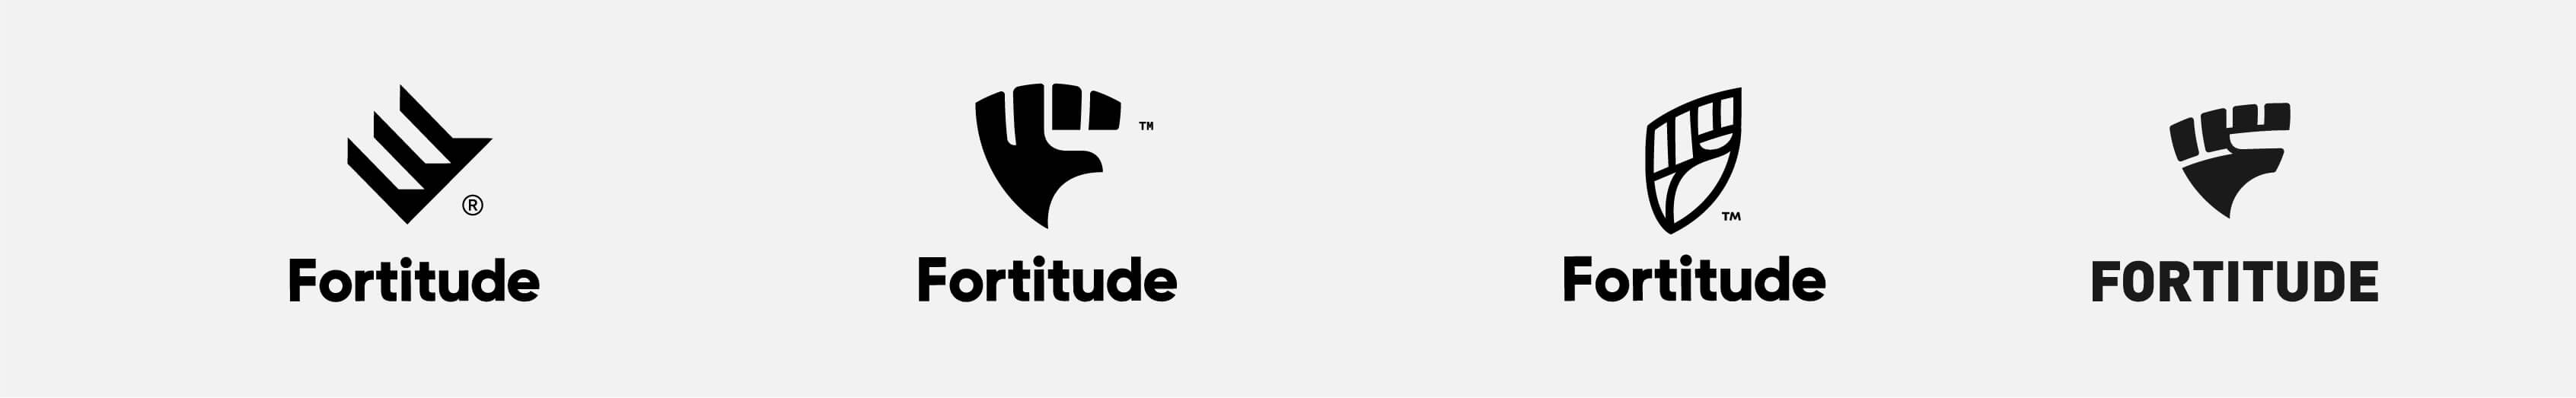 branding-clothing-logo-fortitude